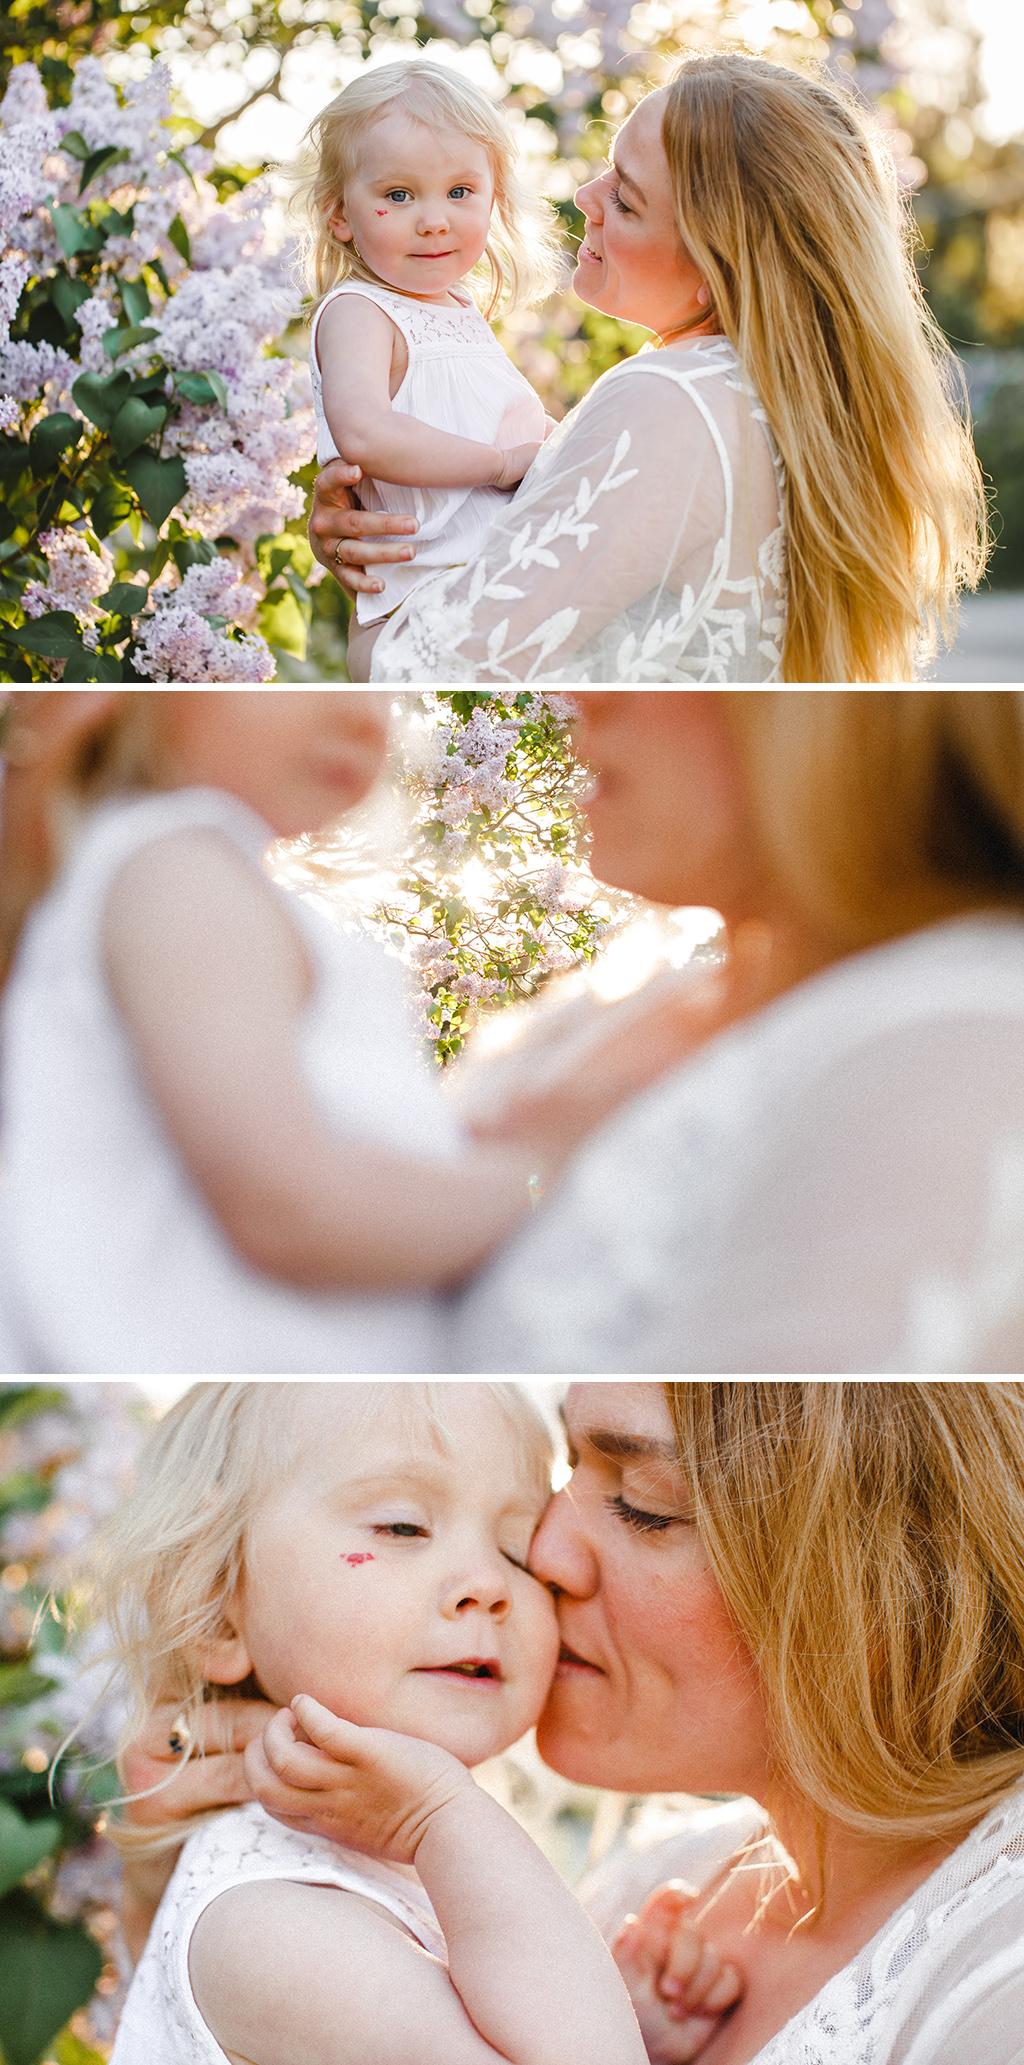 Familjefotograf_Stockholm_Syrener_familjefotografering_4.jpg